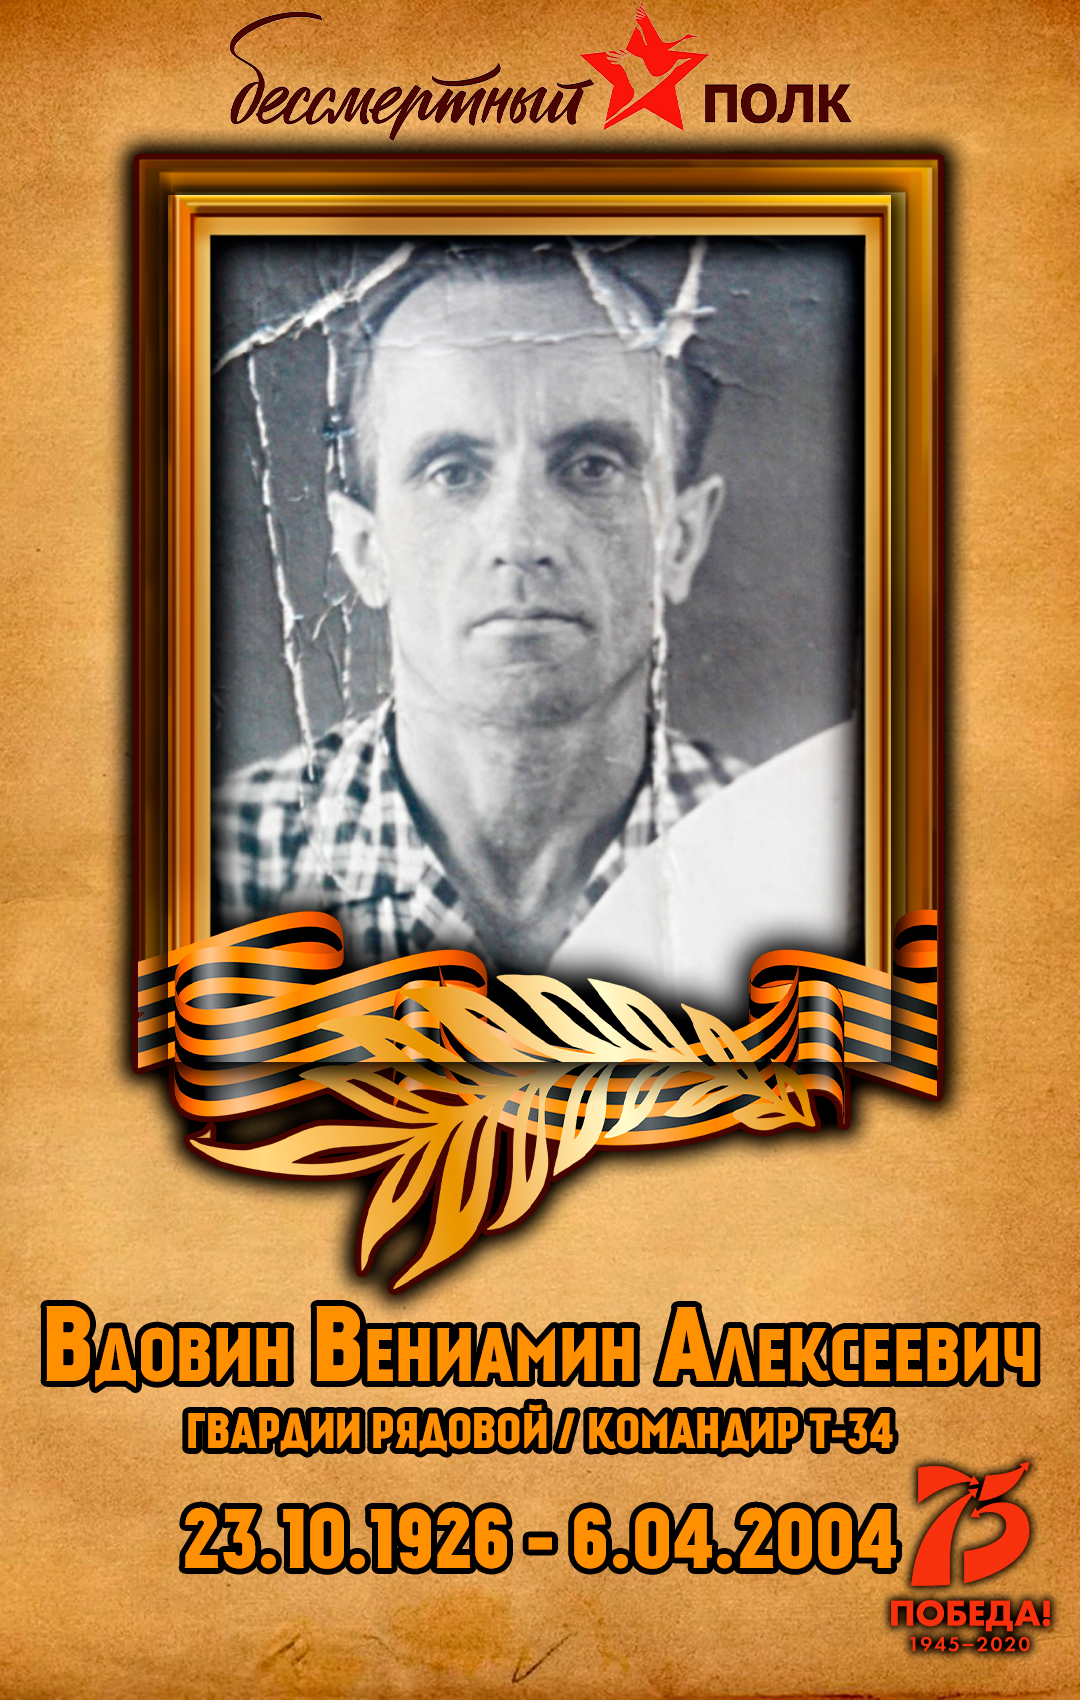 Вдовин-Вениамин-Алексеевич